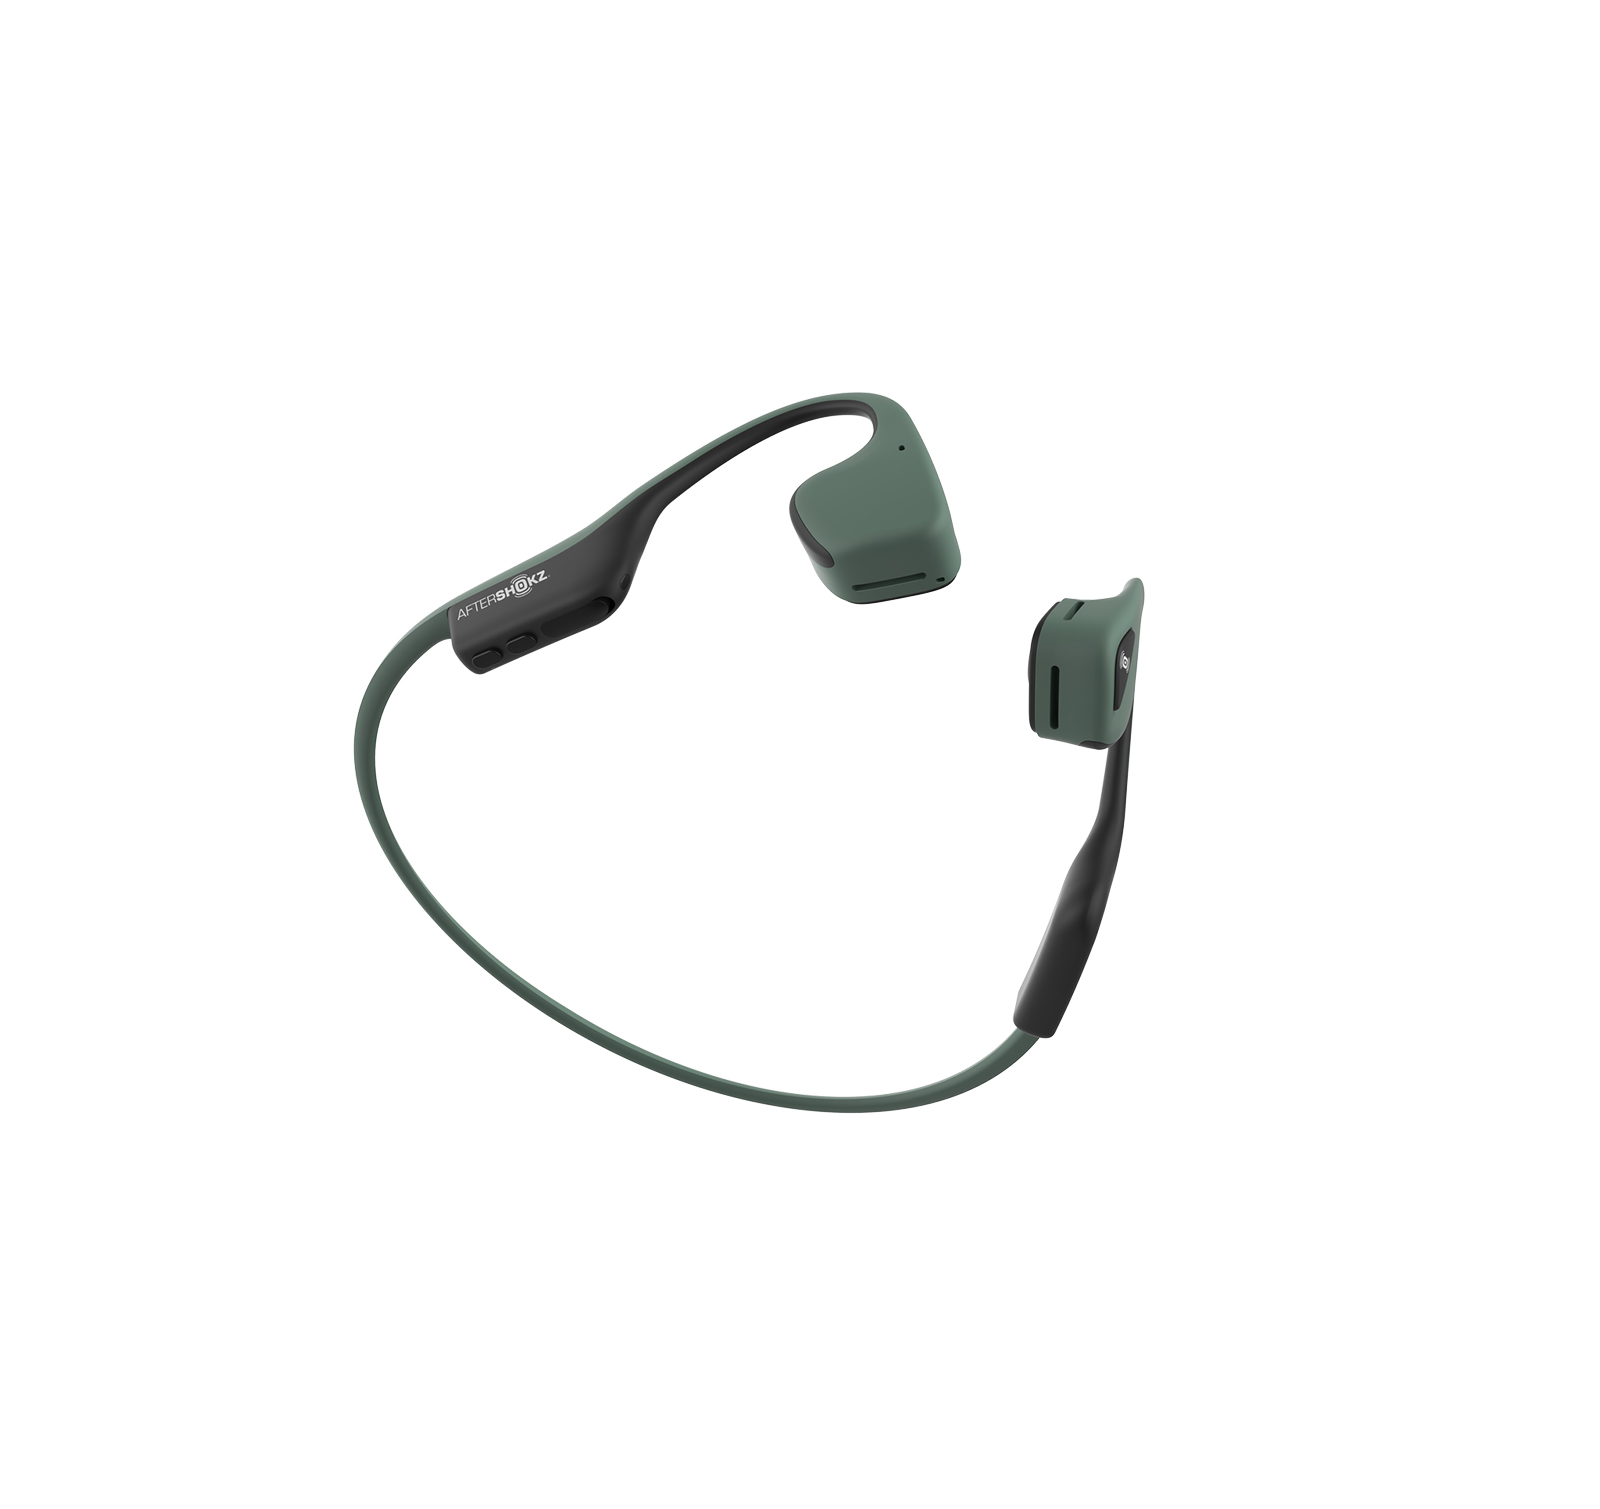 AfterShokz-Trekz-Air-Wireless-Bone-Conduction-Headphones thumbnail 9